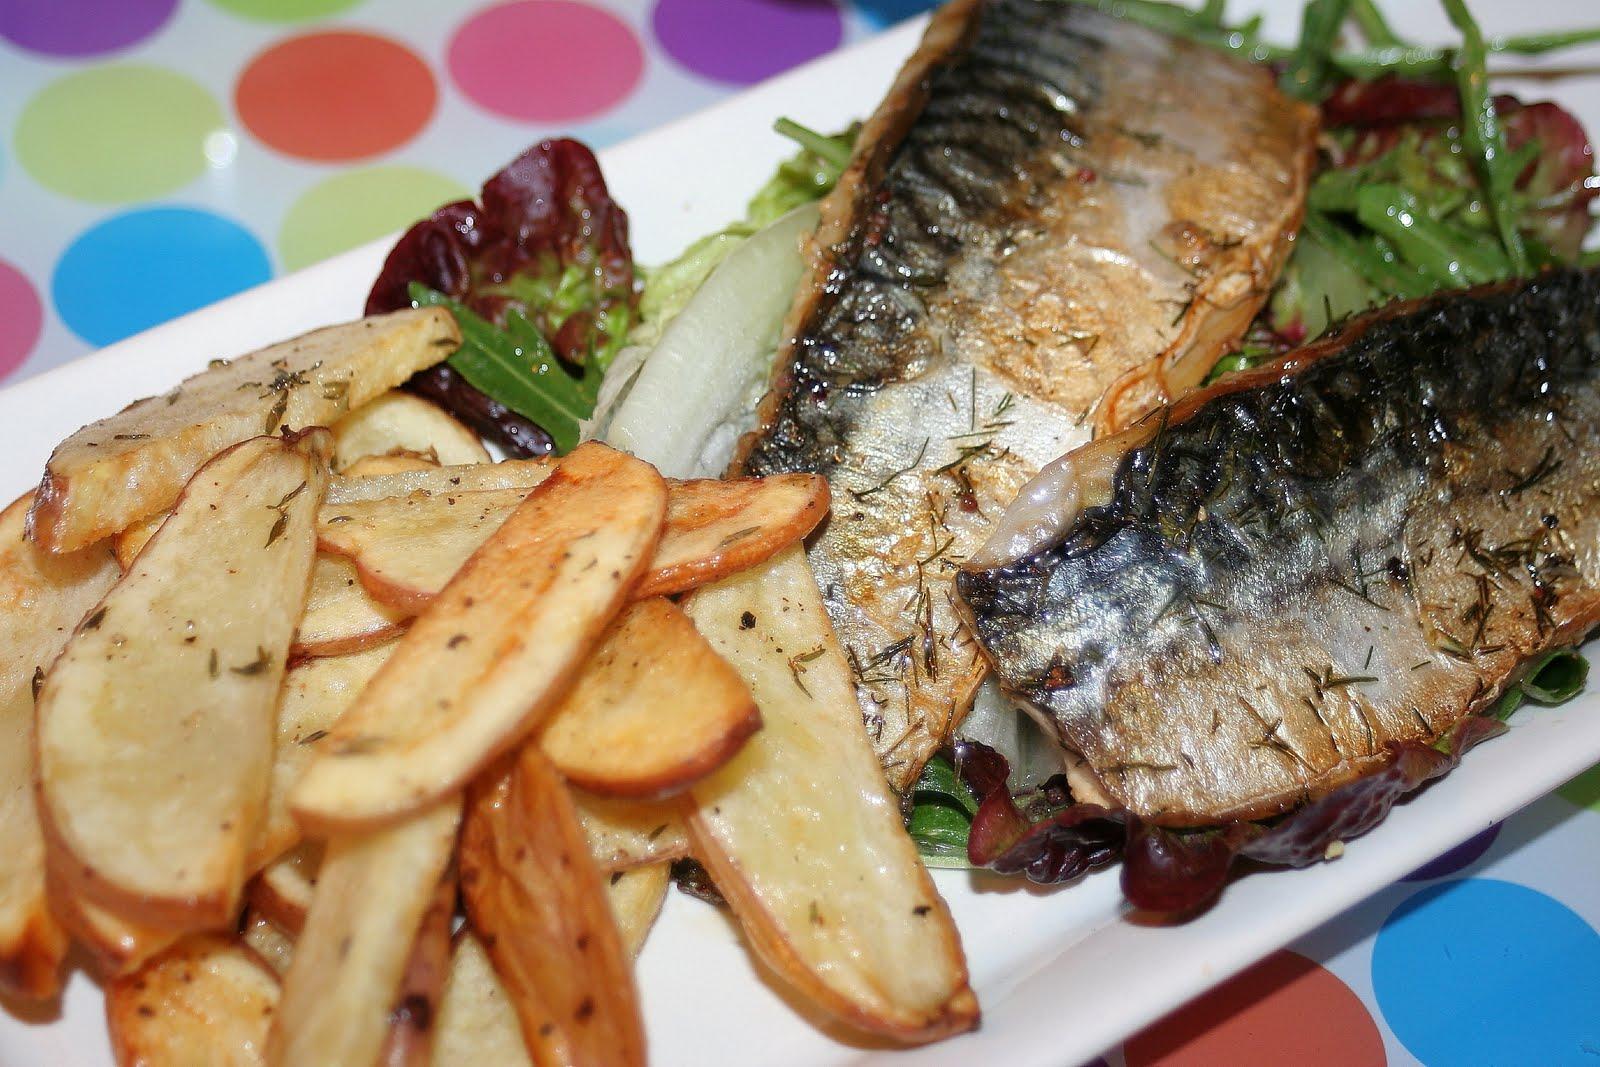 Mat manning 39 s air rifle hunting mackerel and chips for Mackerel fish recipe